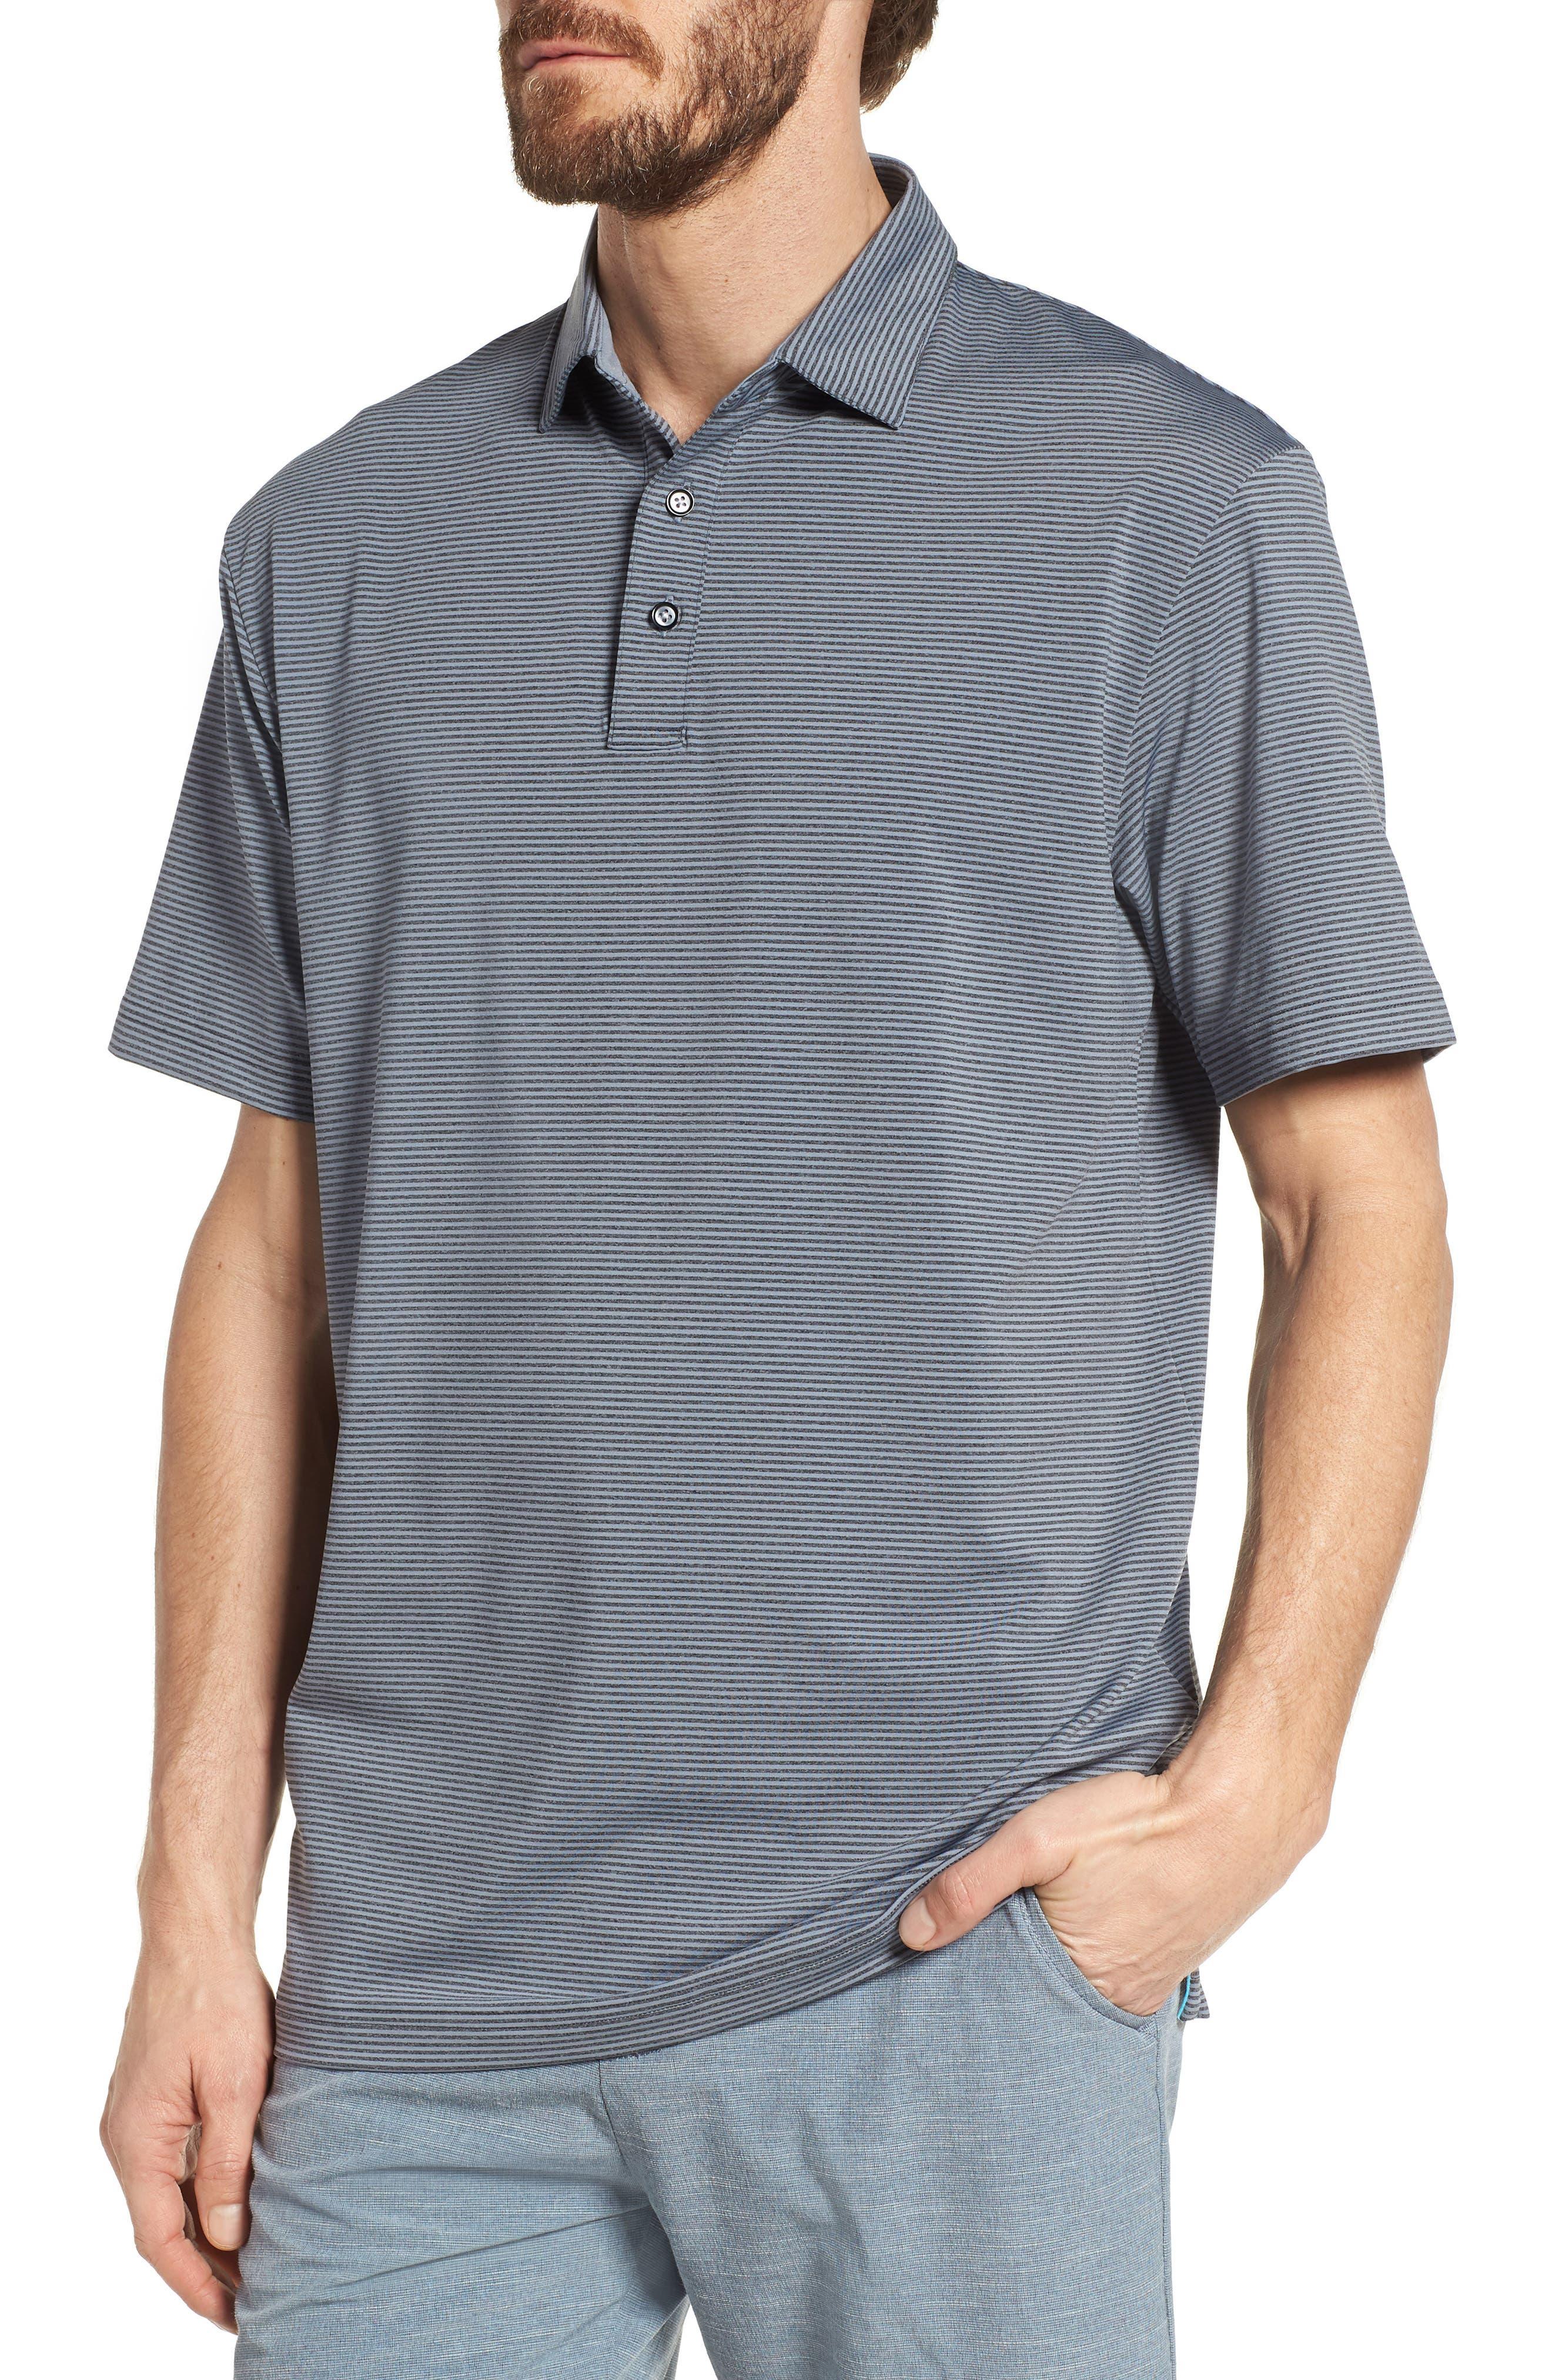 Devereux Oracle Stripe Jersey Polo, Blue